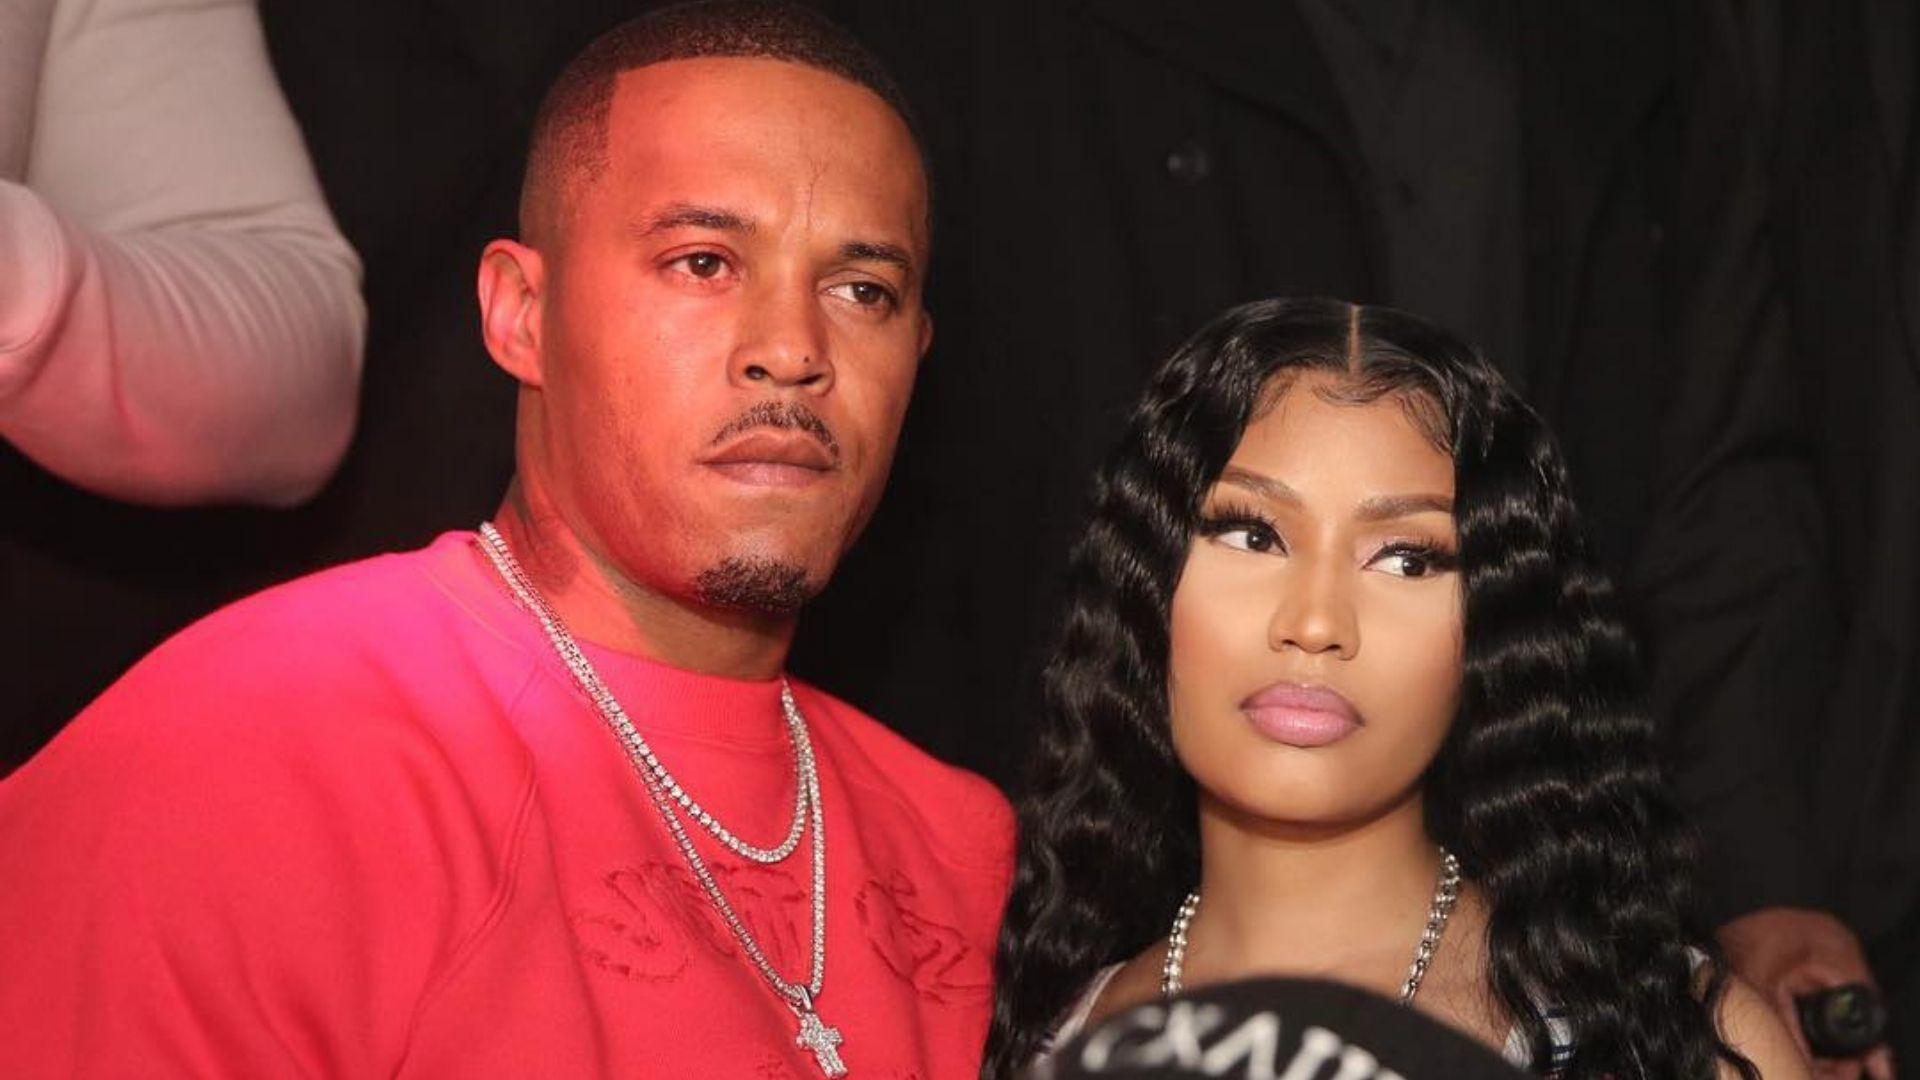 Who Is Nicki Minaj's New Husband, Kenneth Petty?